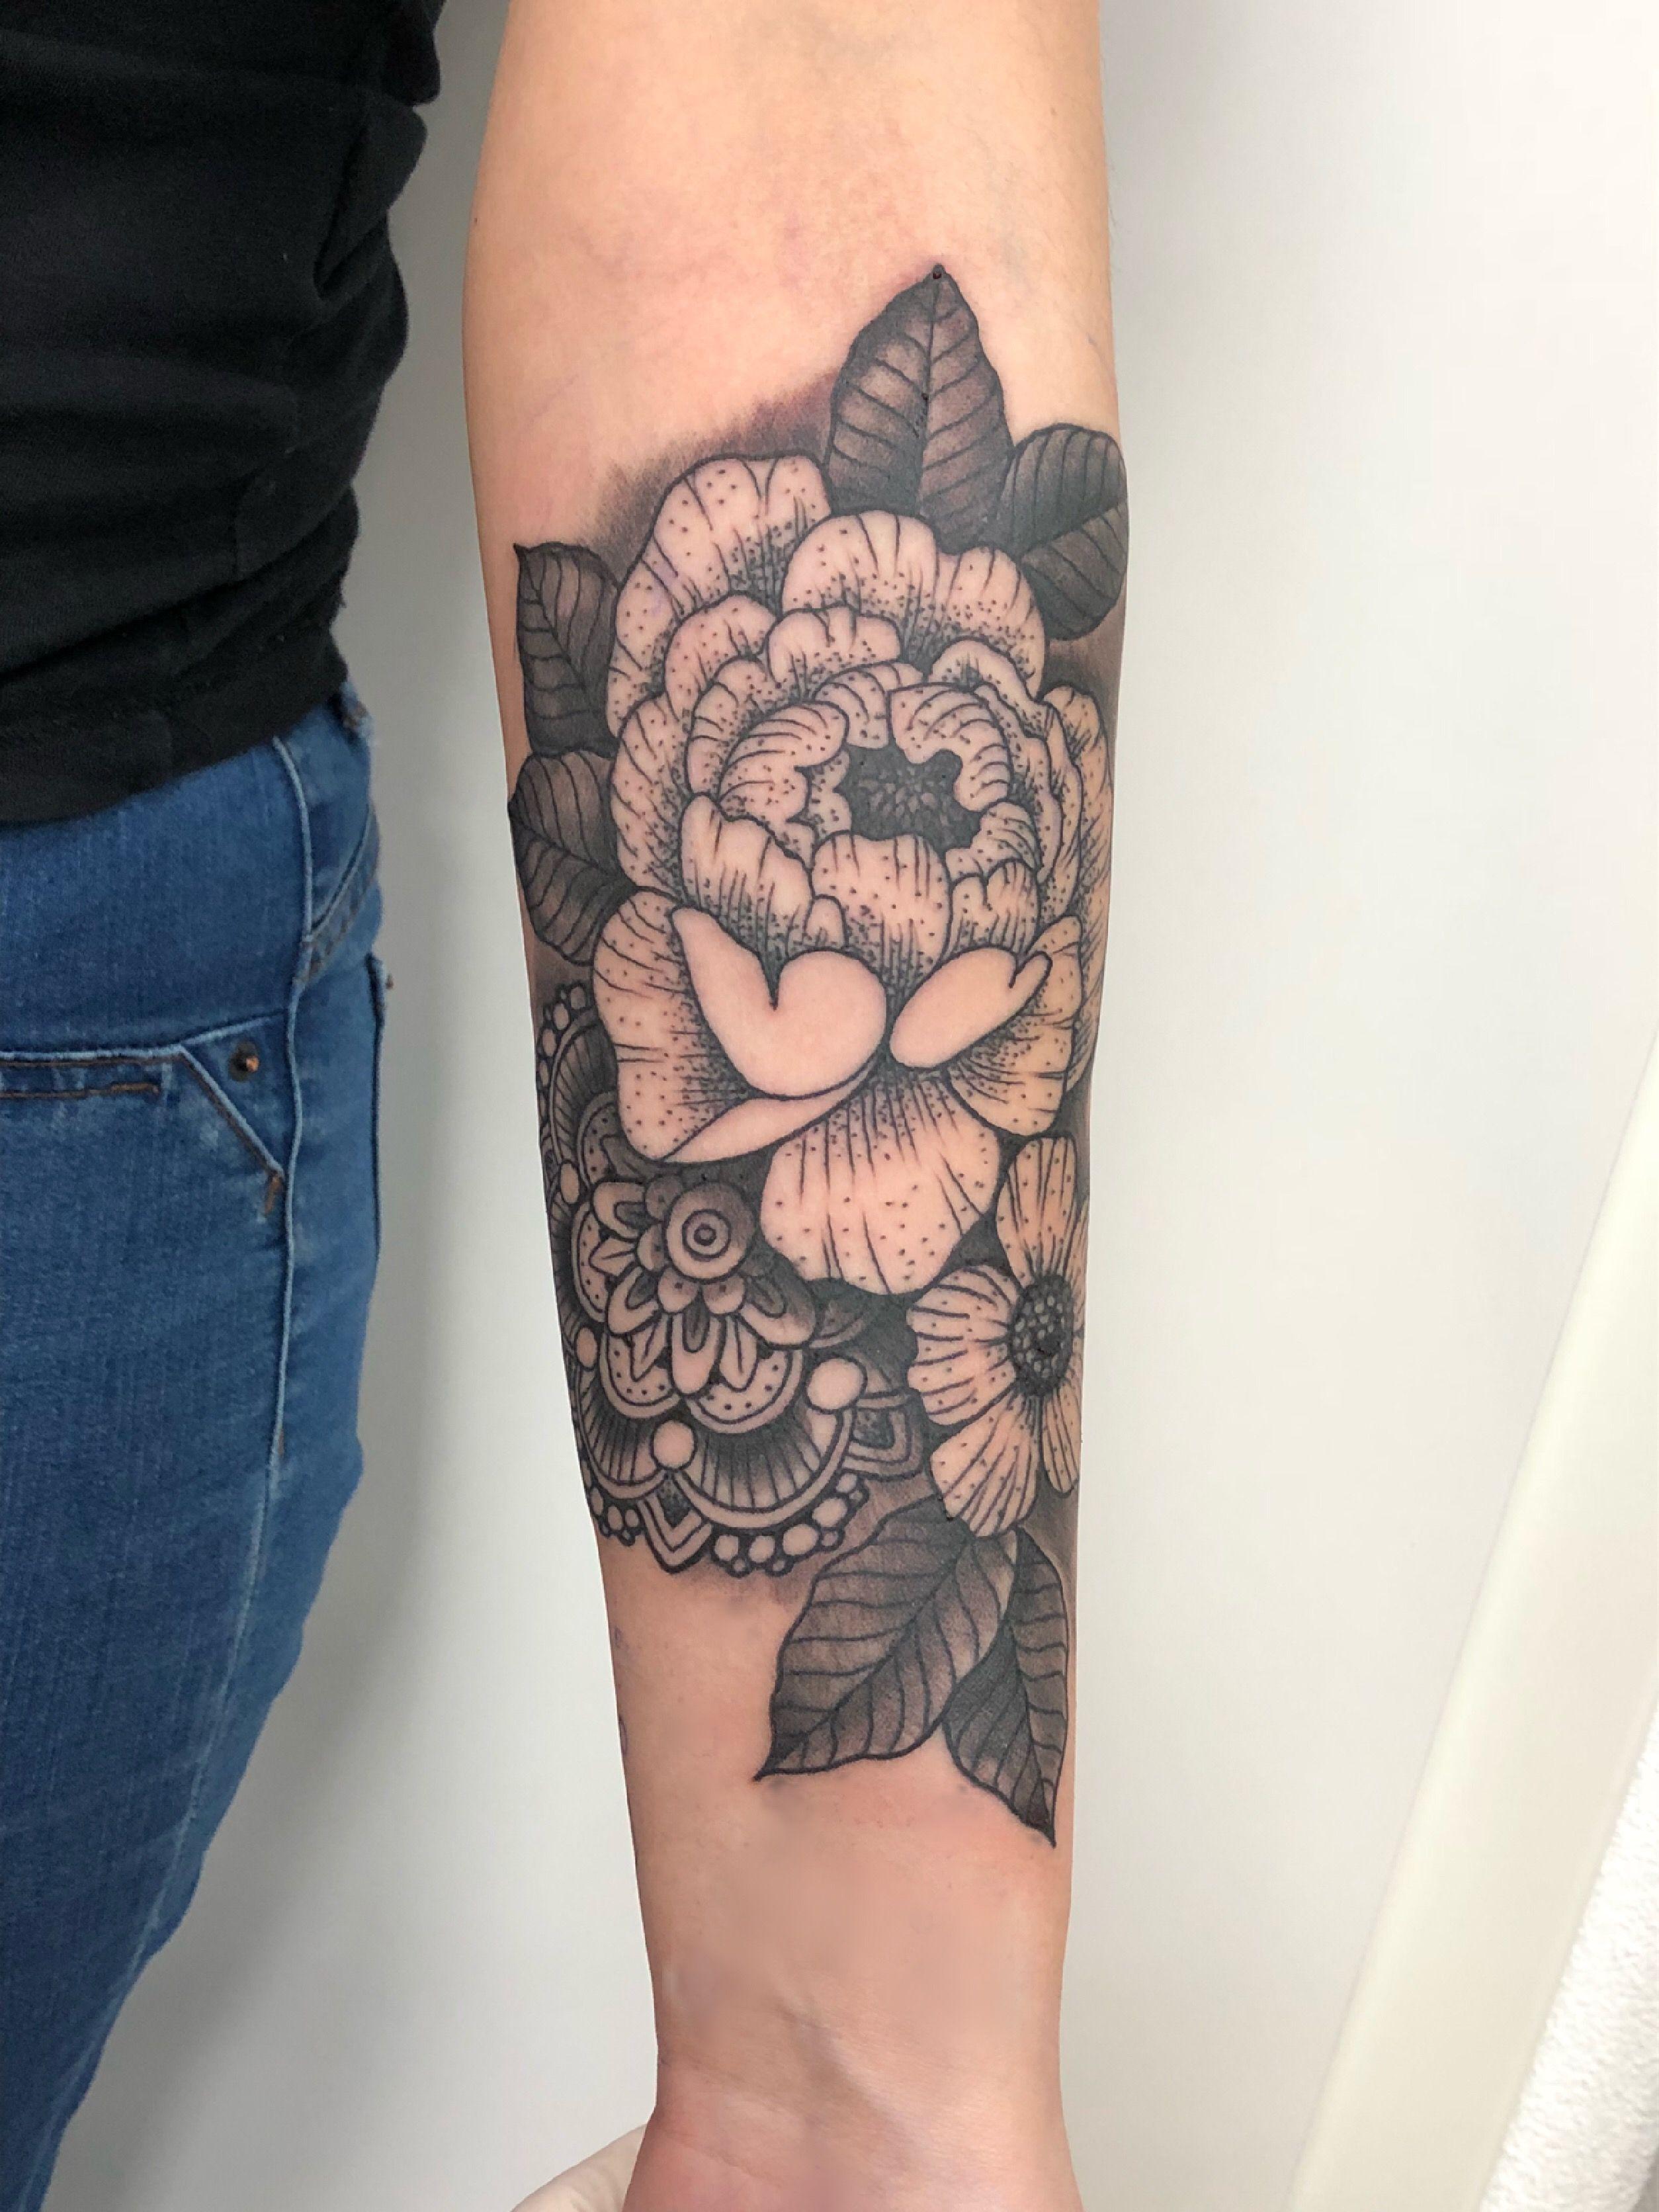 tattoo unterarm tattoo unterarm blumen girl tattooed flowers girly inked inkedgirl. Black Bedroom Furniture Sets. Home Design Ideas